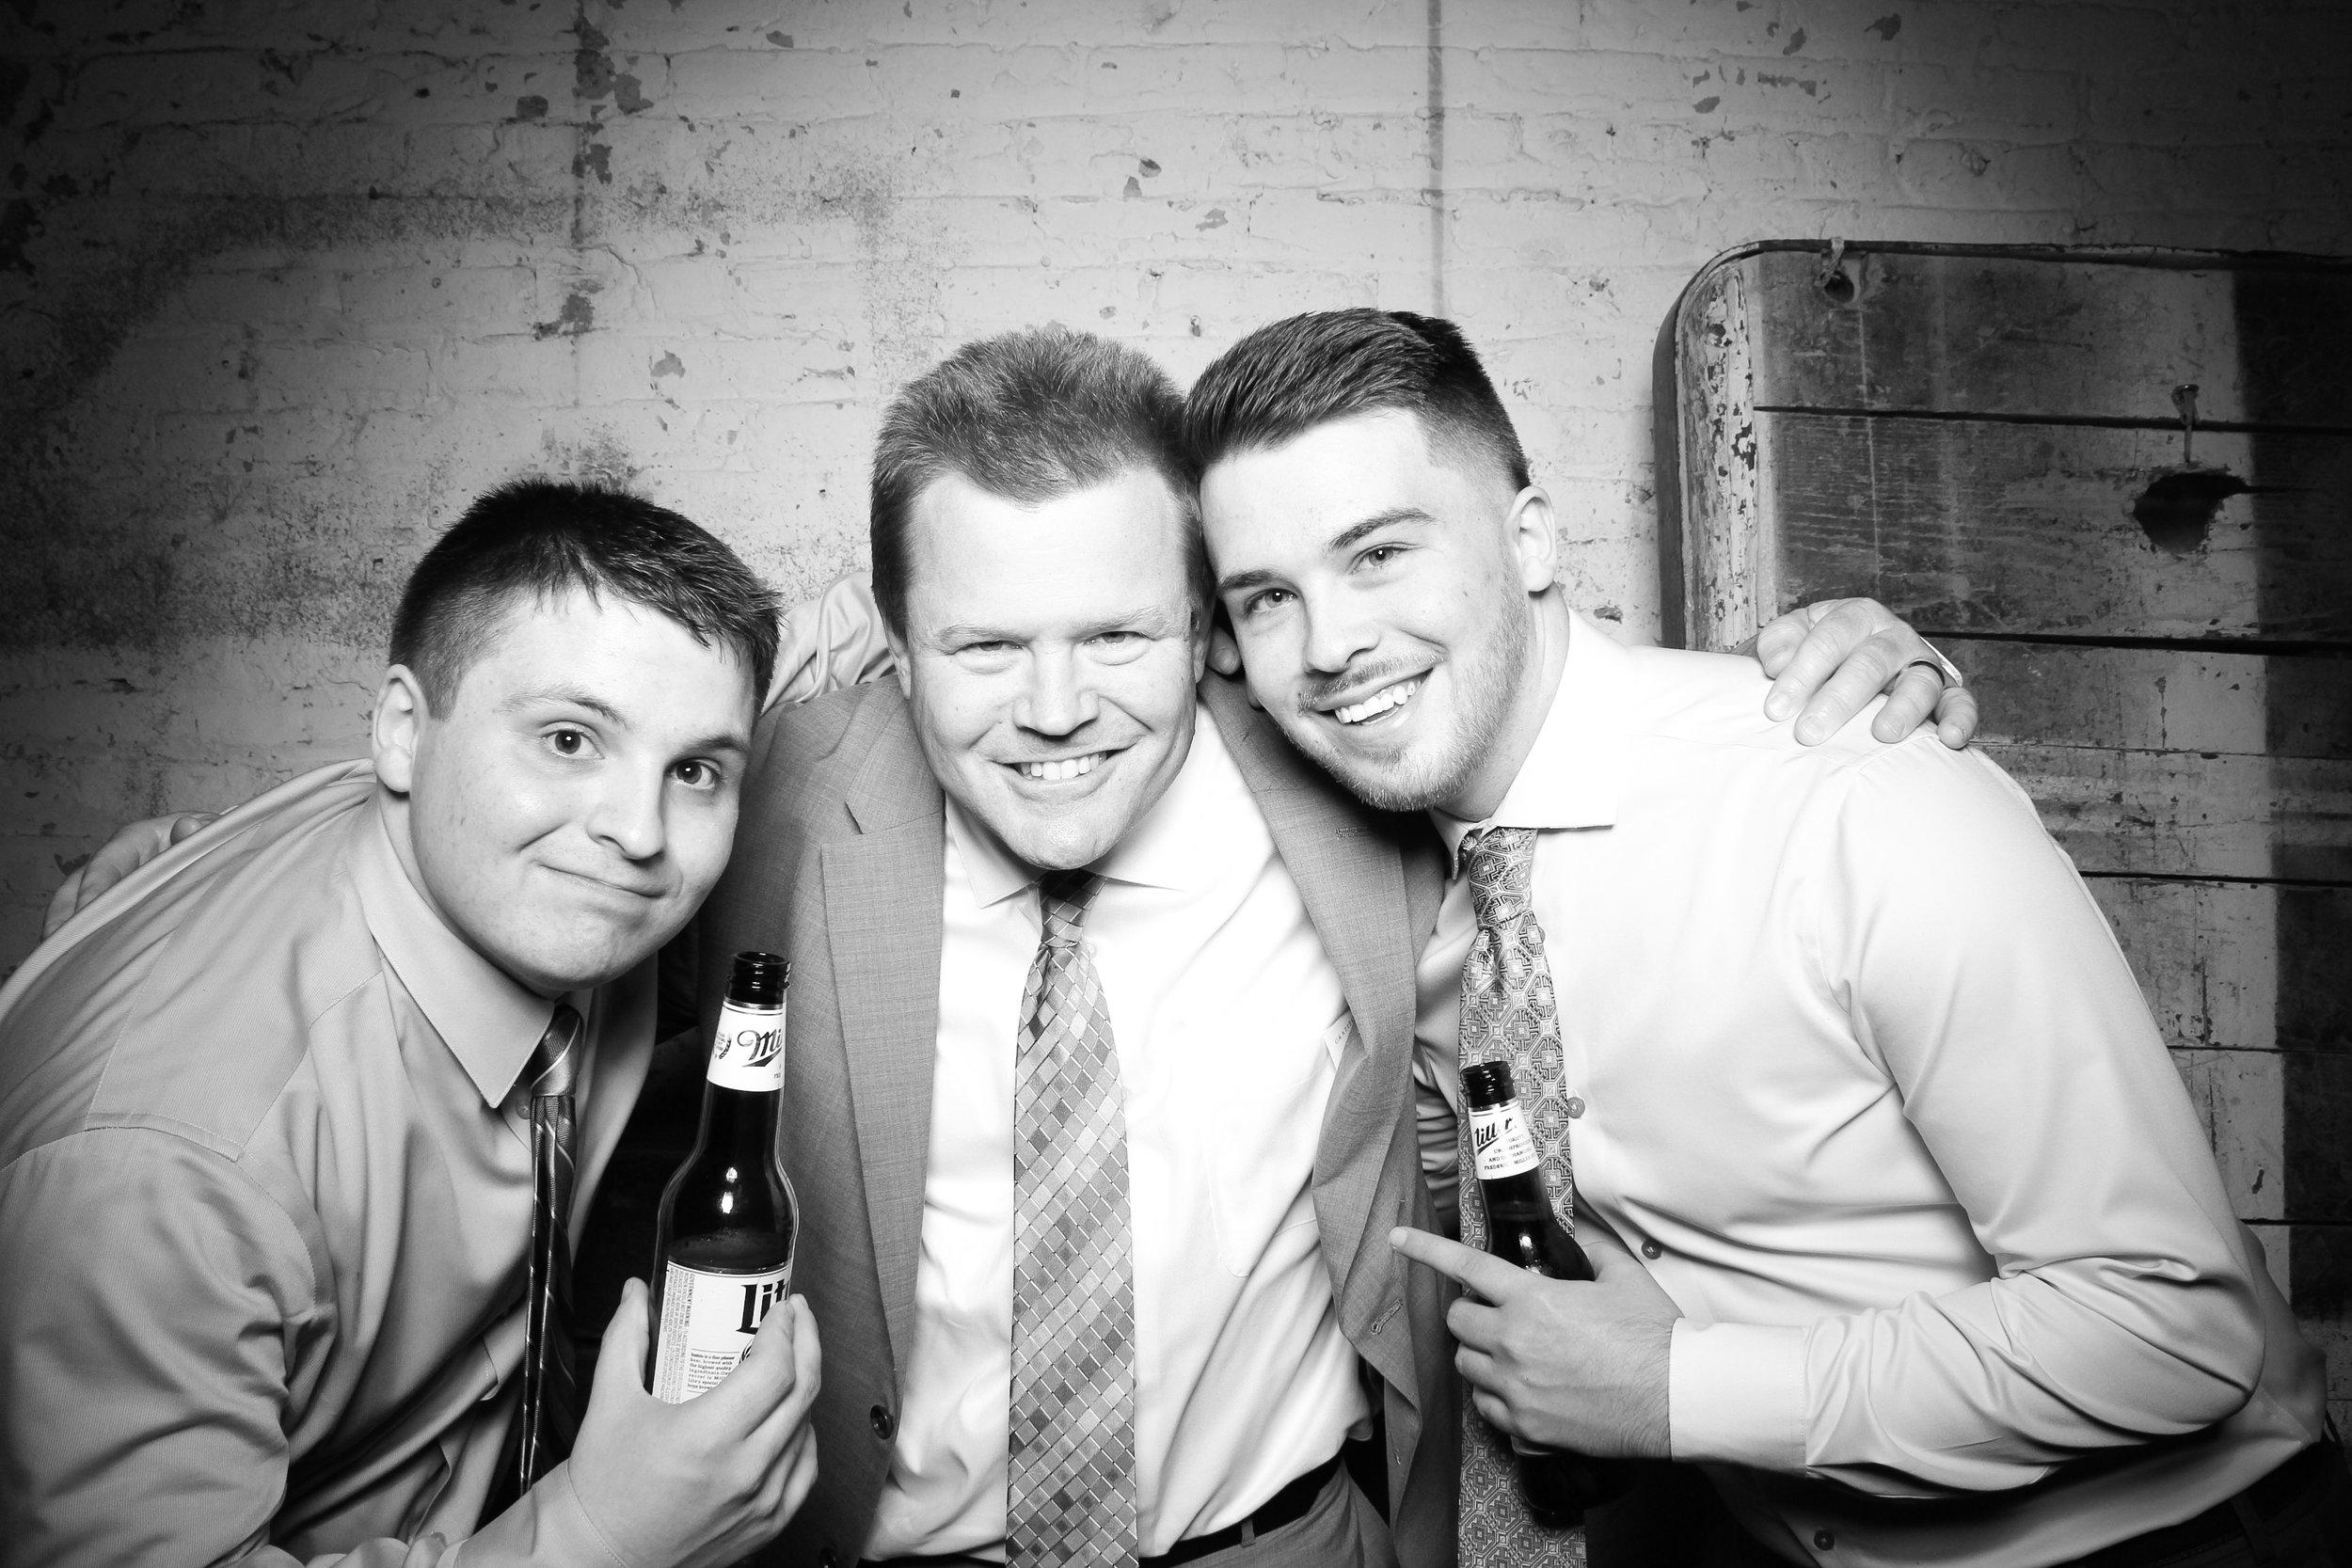 The_Joinery_Wedding_Venue_Logan_Square_Reception_28.jpg